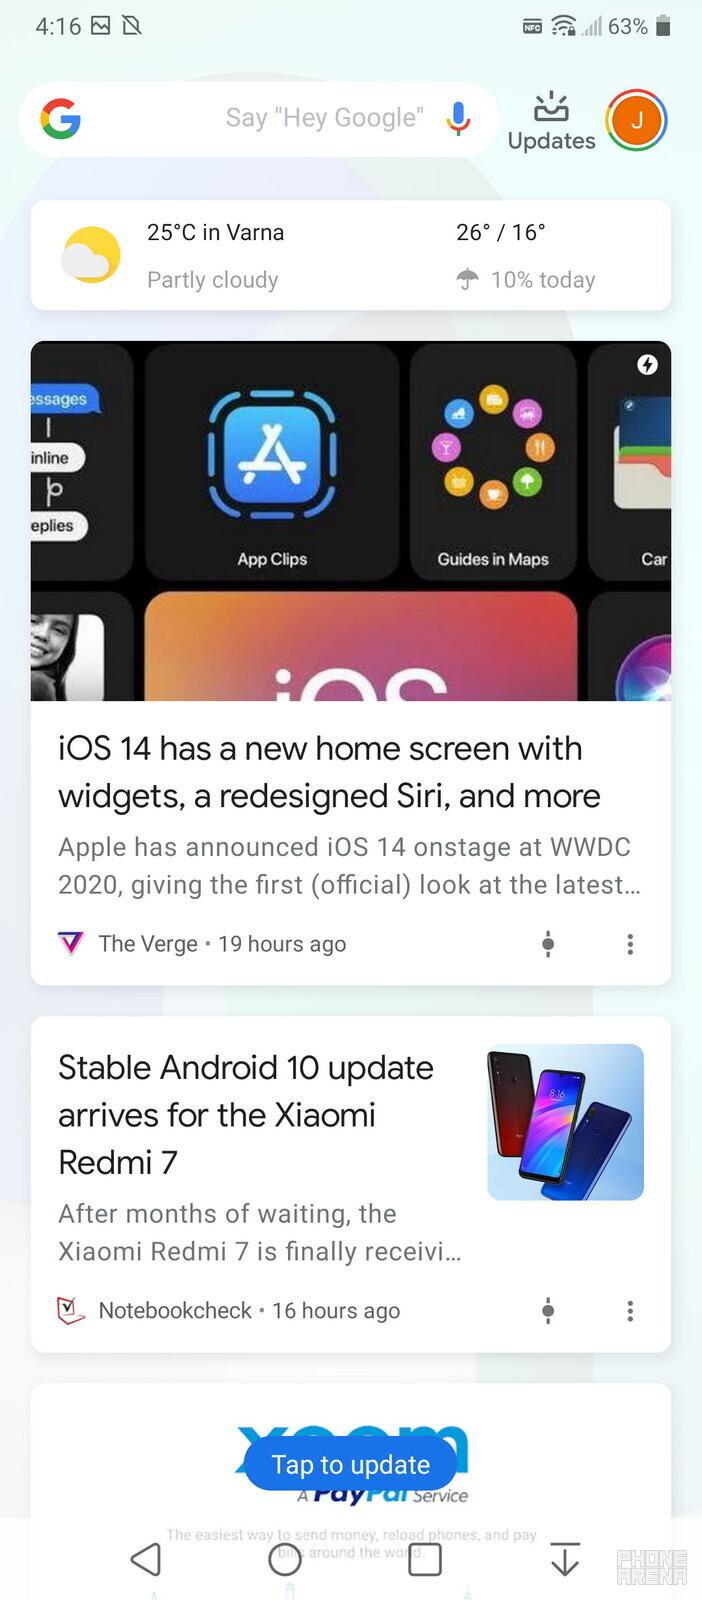 The LG Velvet comes with Android 10 - LG Velvet review